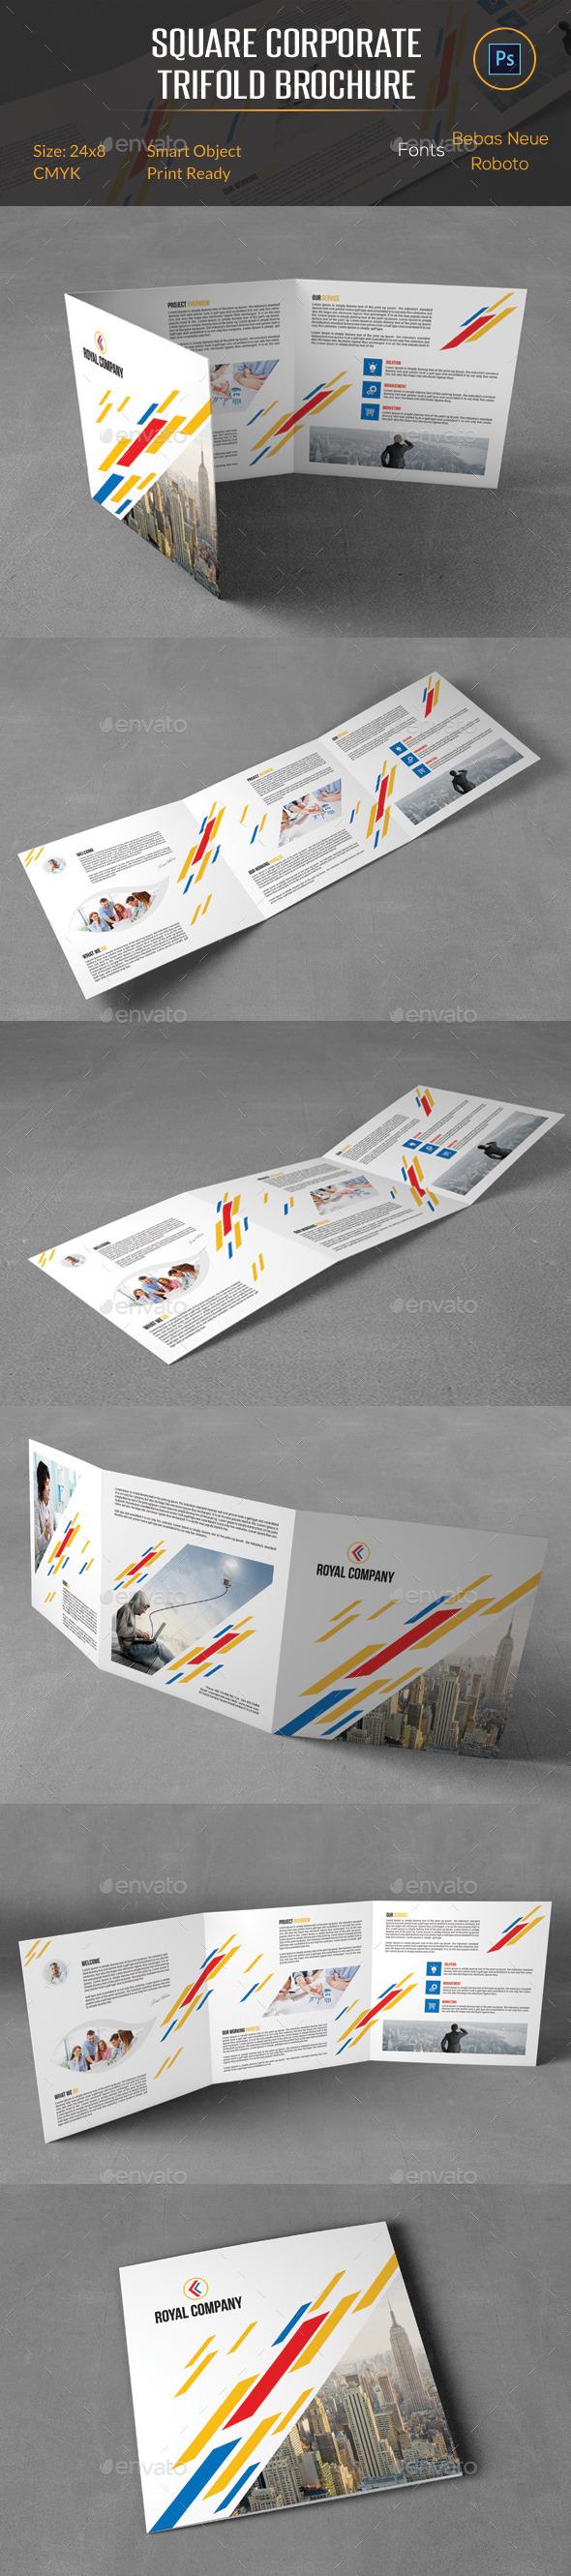 Square Corporate Trifold Brochure - Corporate Brochures